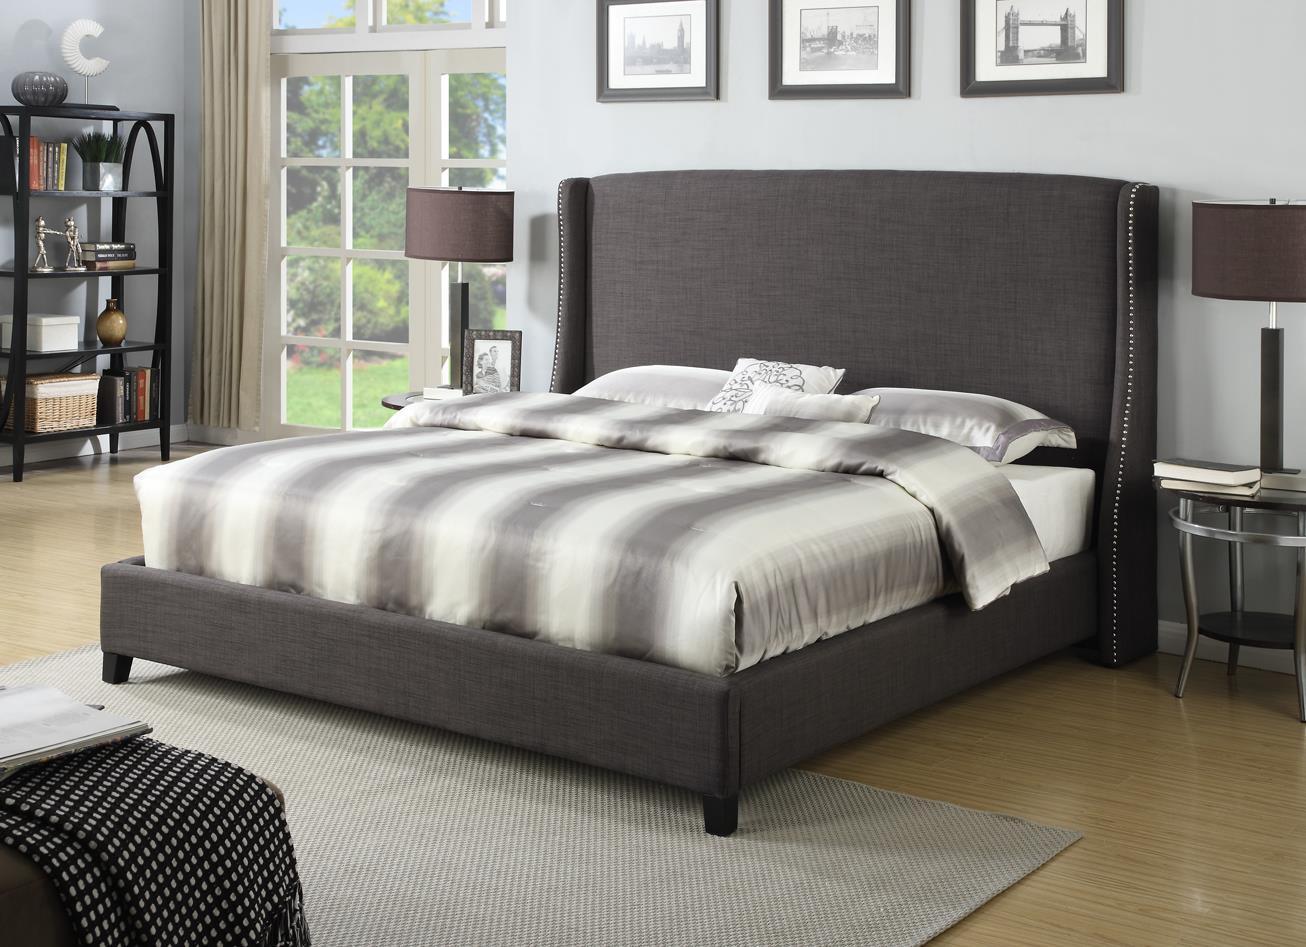 Morris Home Furnishings Branford Brandford King Bed - Item Number: 448113439